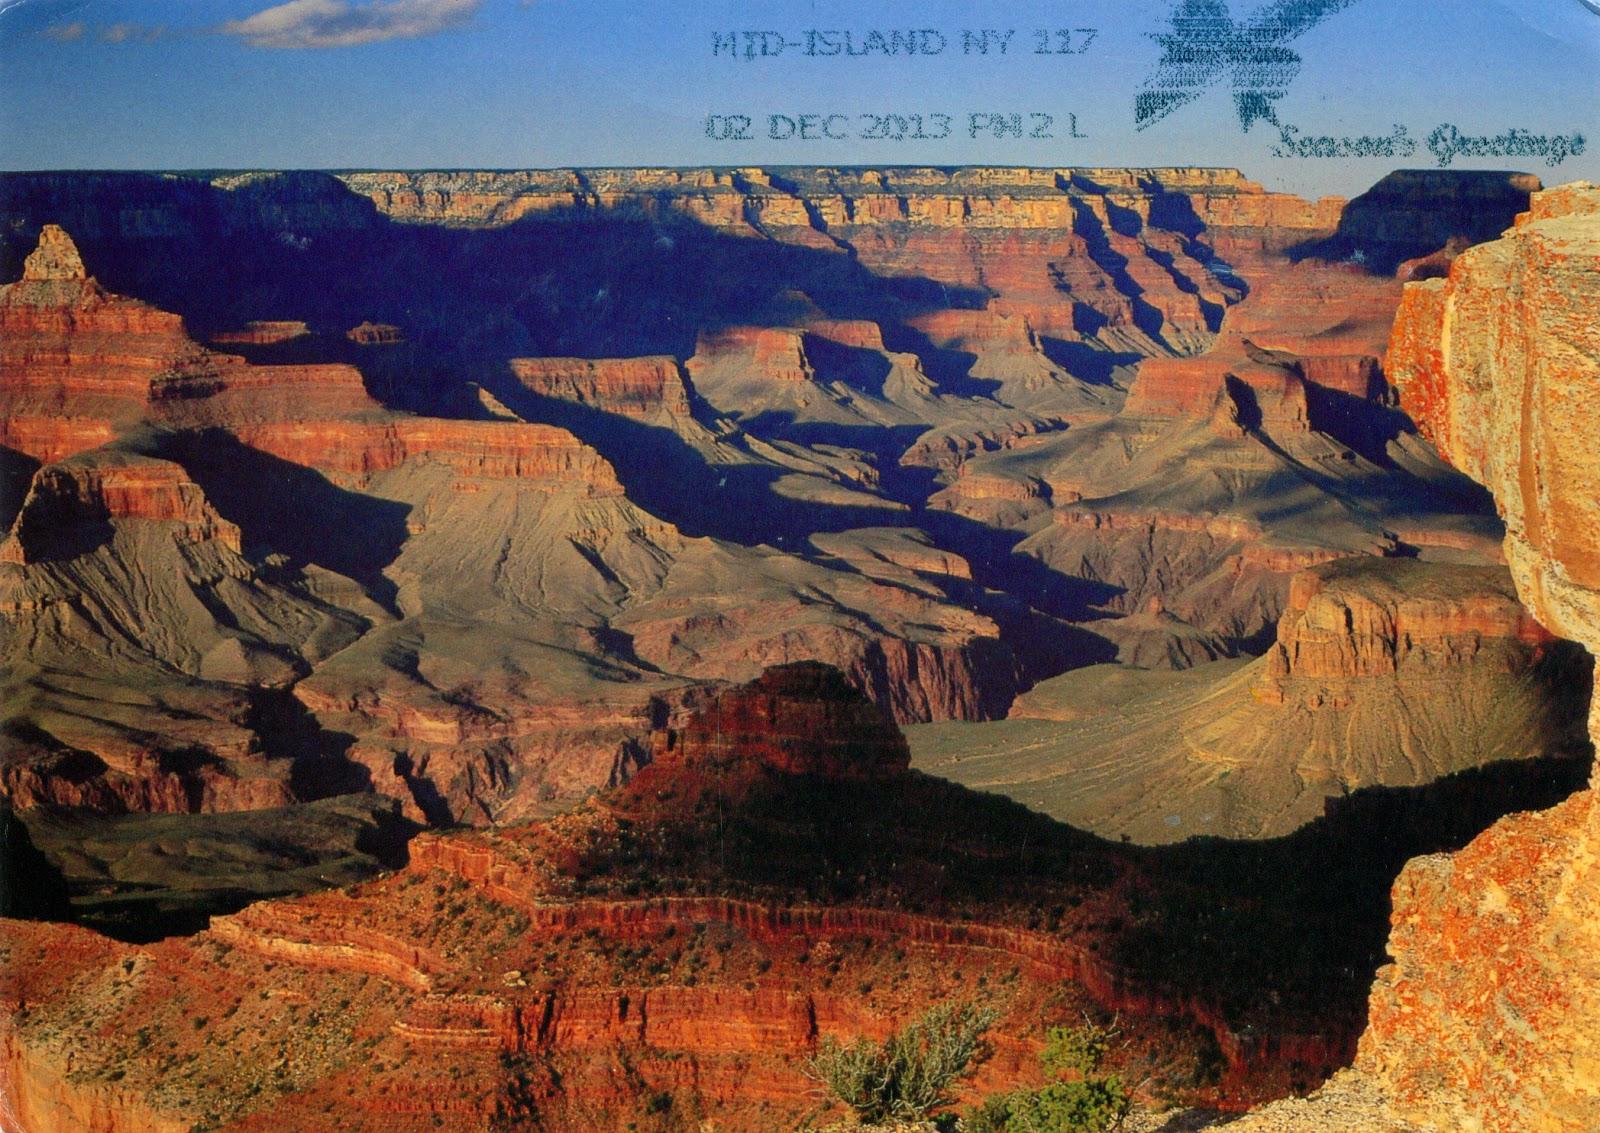 Grand Canyon (AZ) United States  city photos : ... 1000 UNITED STATES Arizona Grand Canyon National Park UNESCO WHS